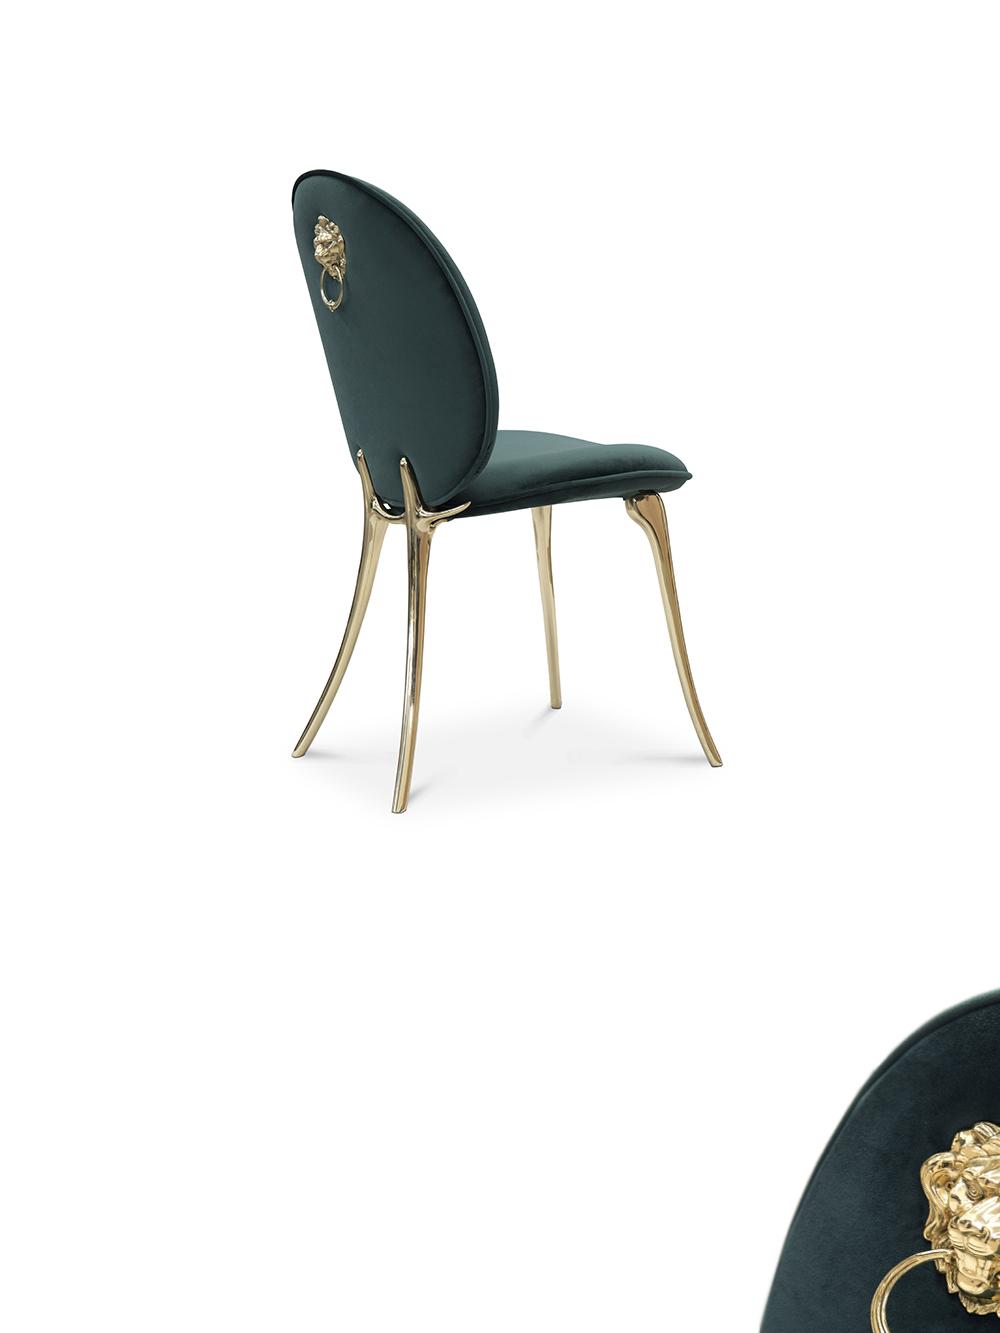 Pleasing Boca Do Lobo Luxury Exclusive Design Furniture Manufactures Uwap Interior Chair Design Uwaporg